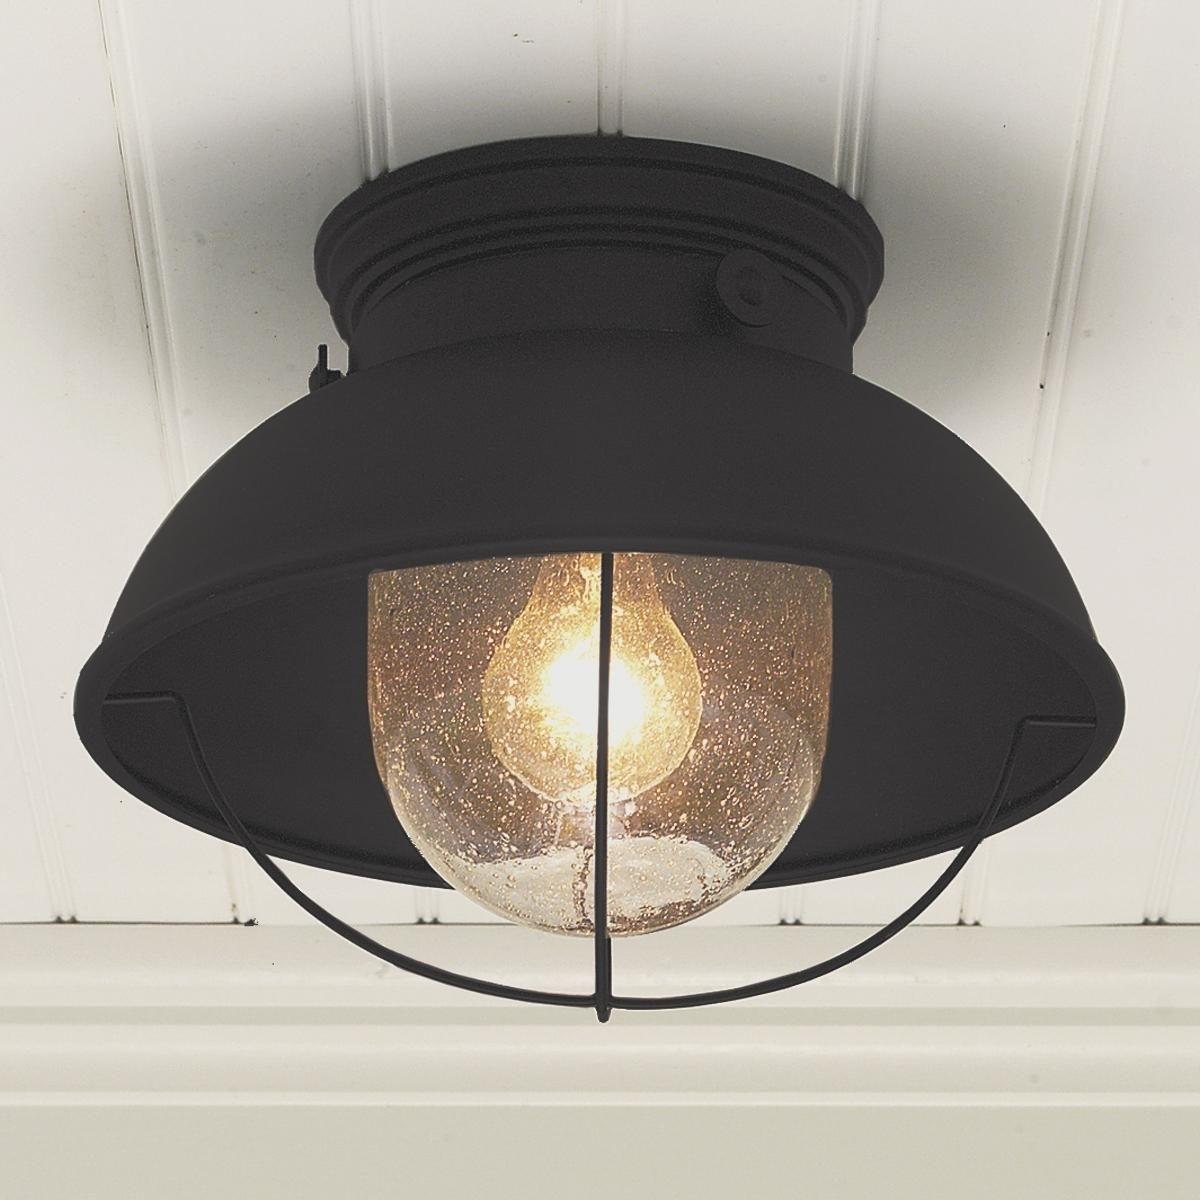 Ceiling Light : Ceiling Porch Lights Sensor Outdoor Ceiling Fan Throughout Outdoor Ceiling Downlights (#2 of 15)